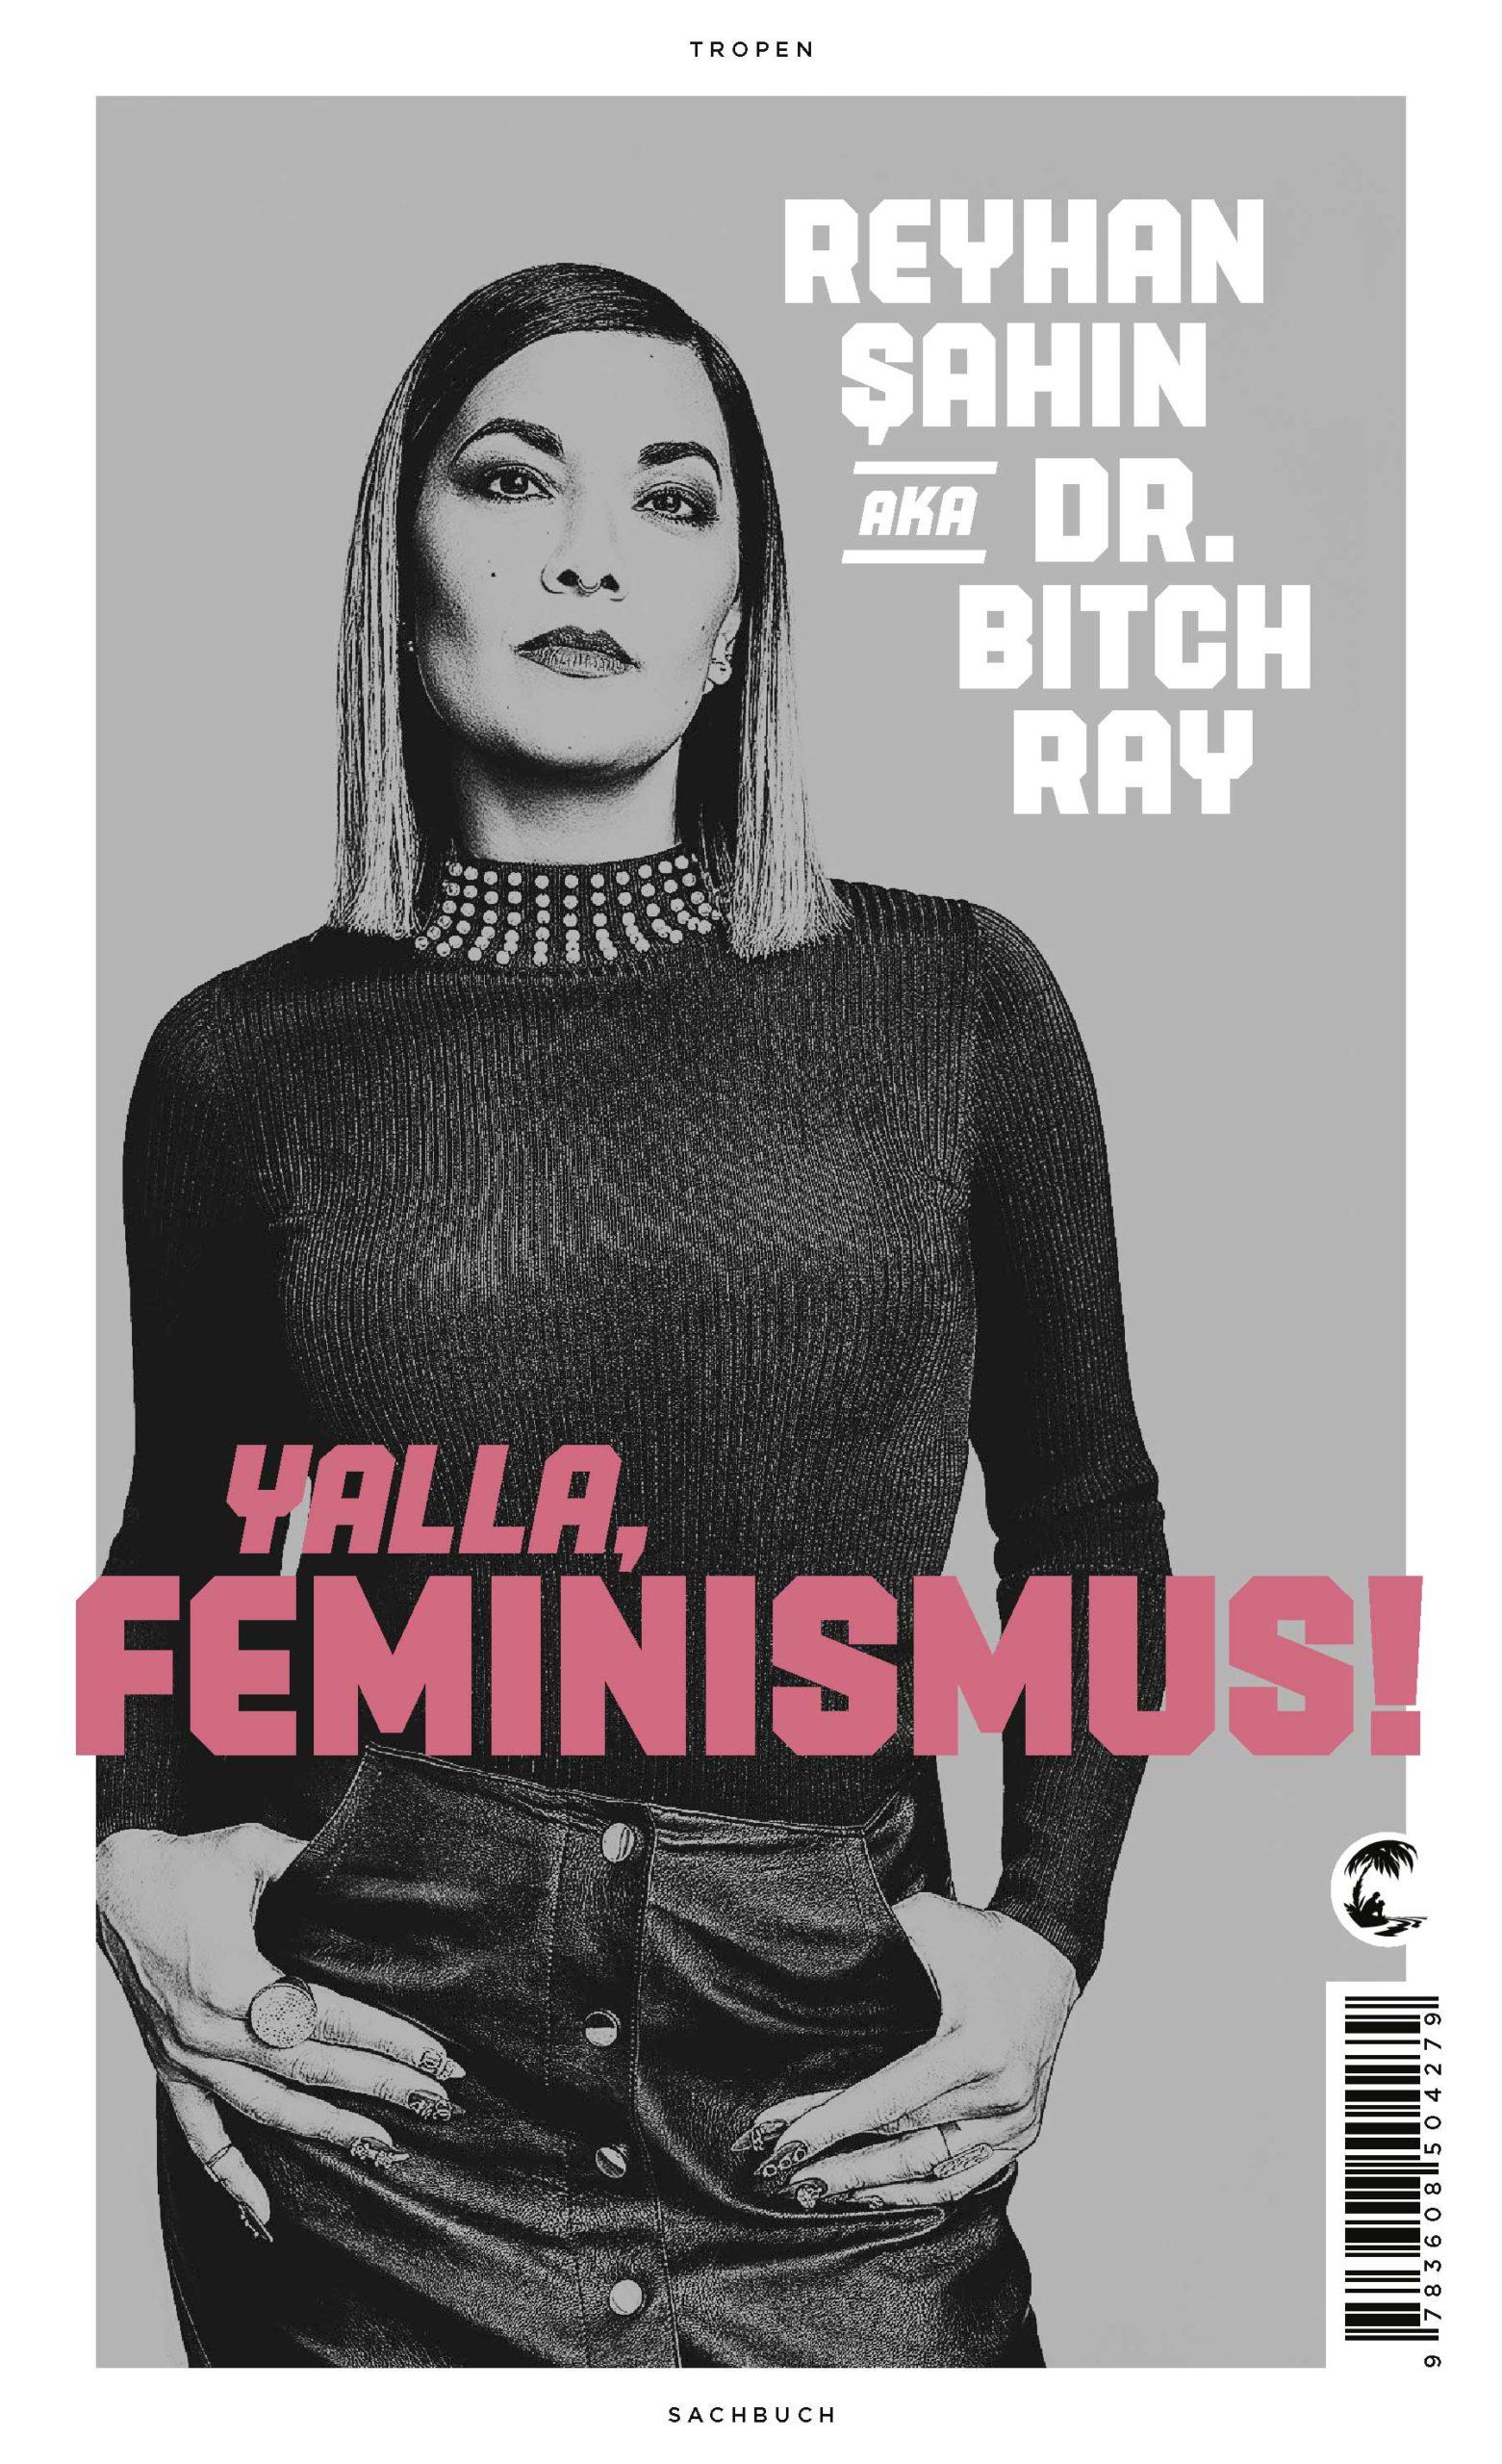 Buchcover: Yalla, Feminismus